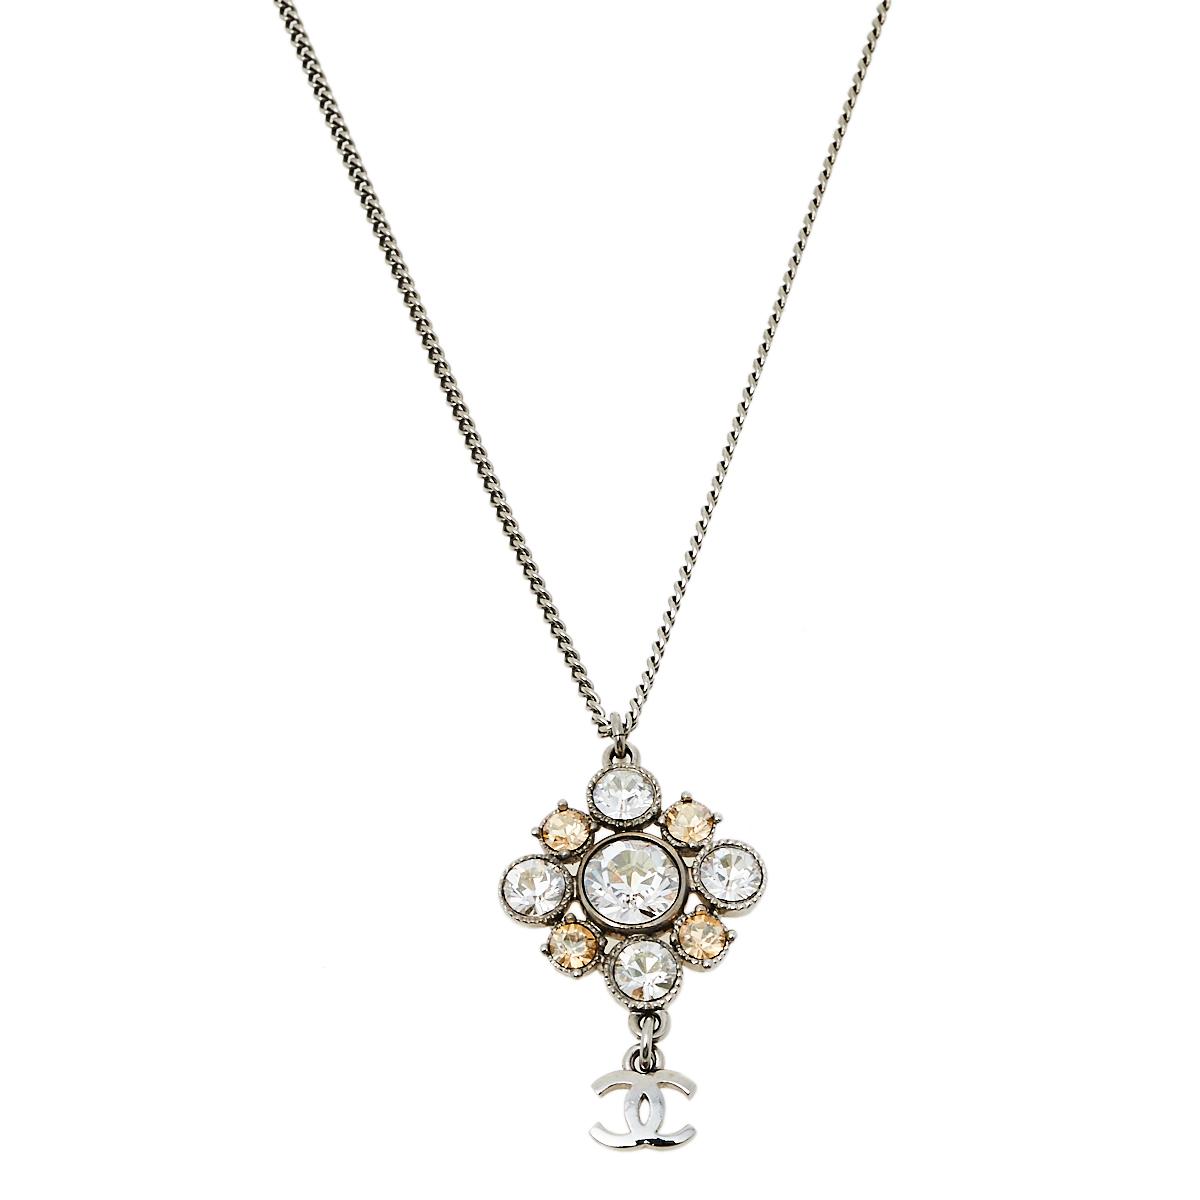 Chanel Silver Tone CC Crystal Pendant Necklace